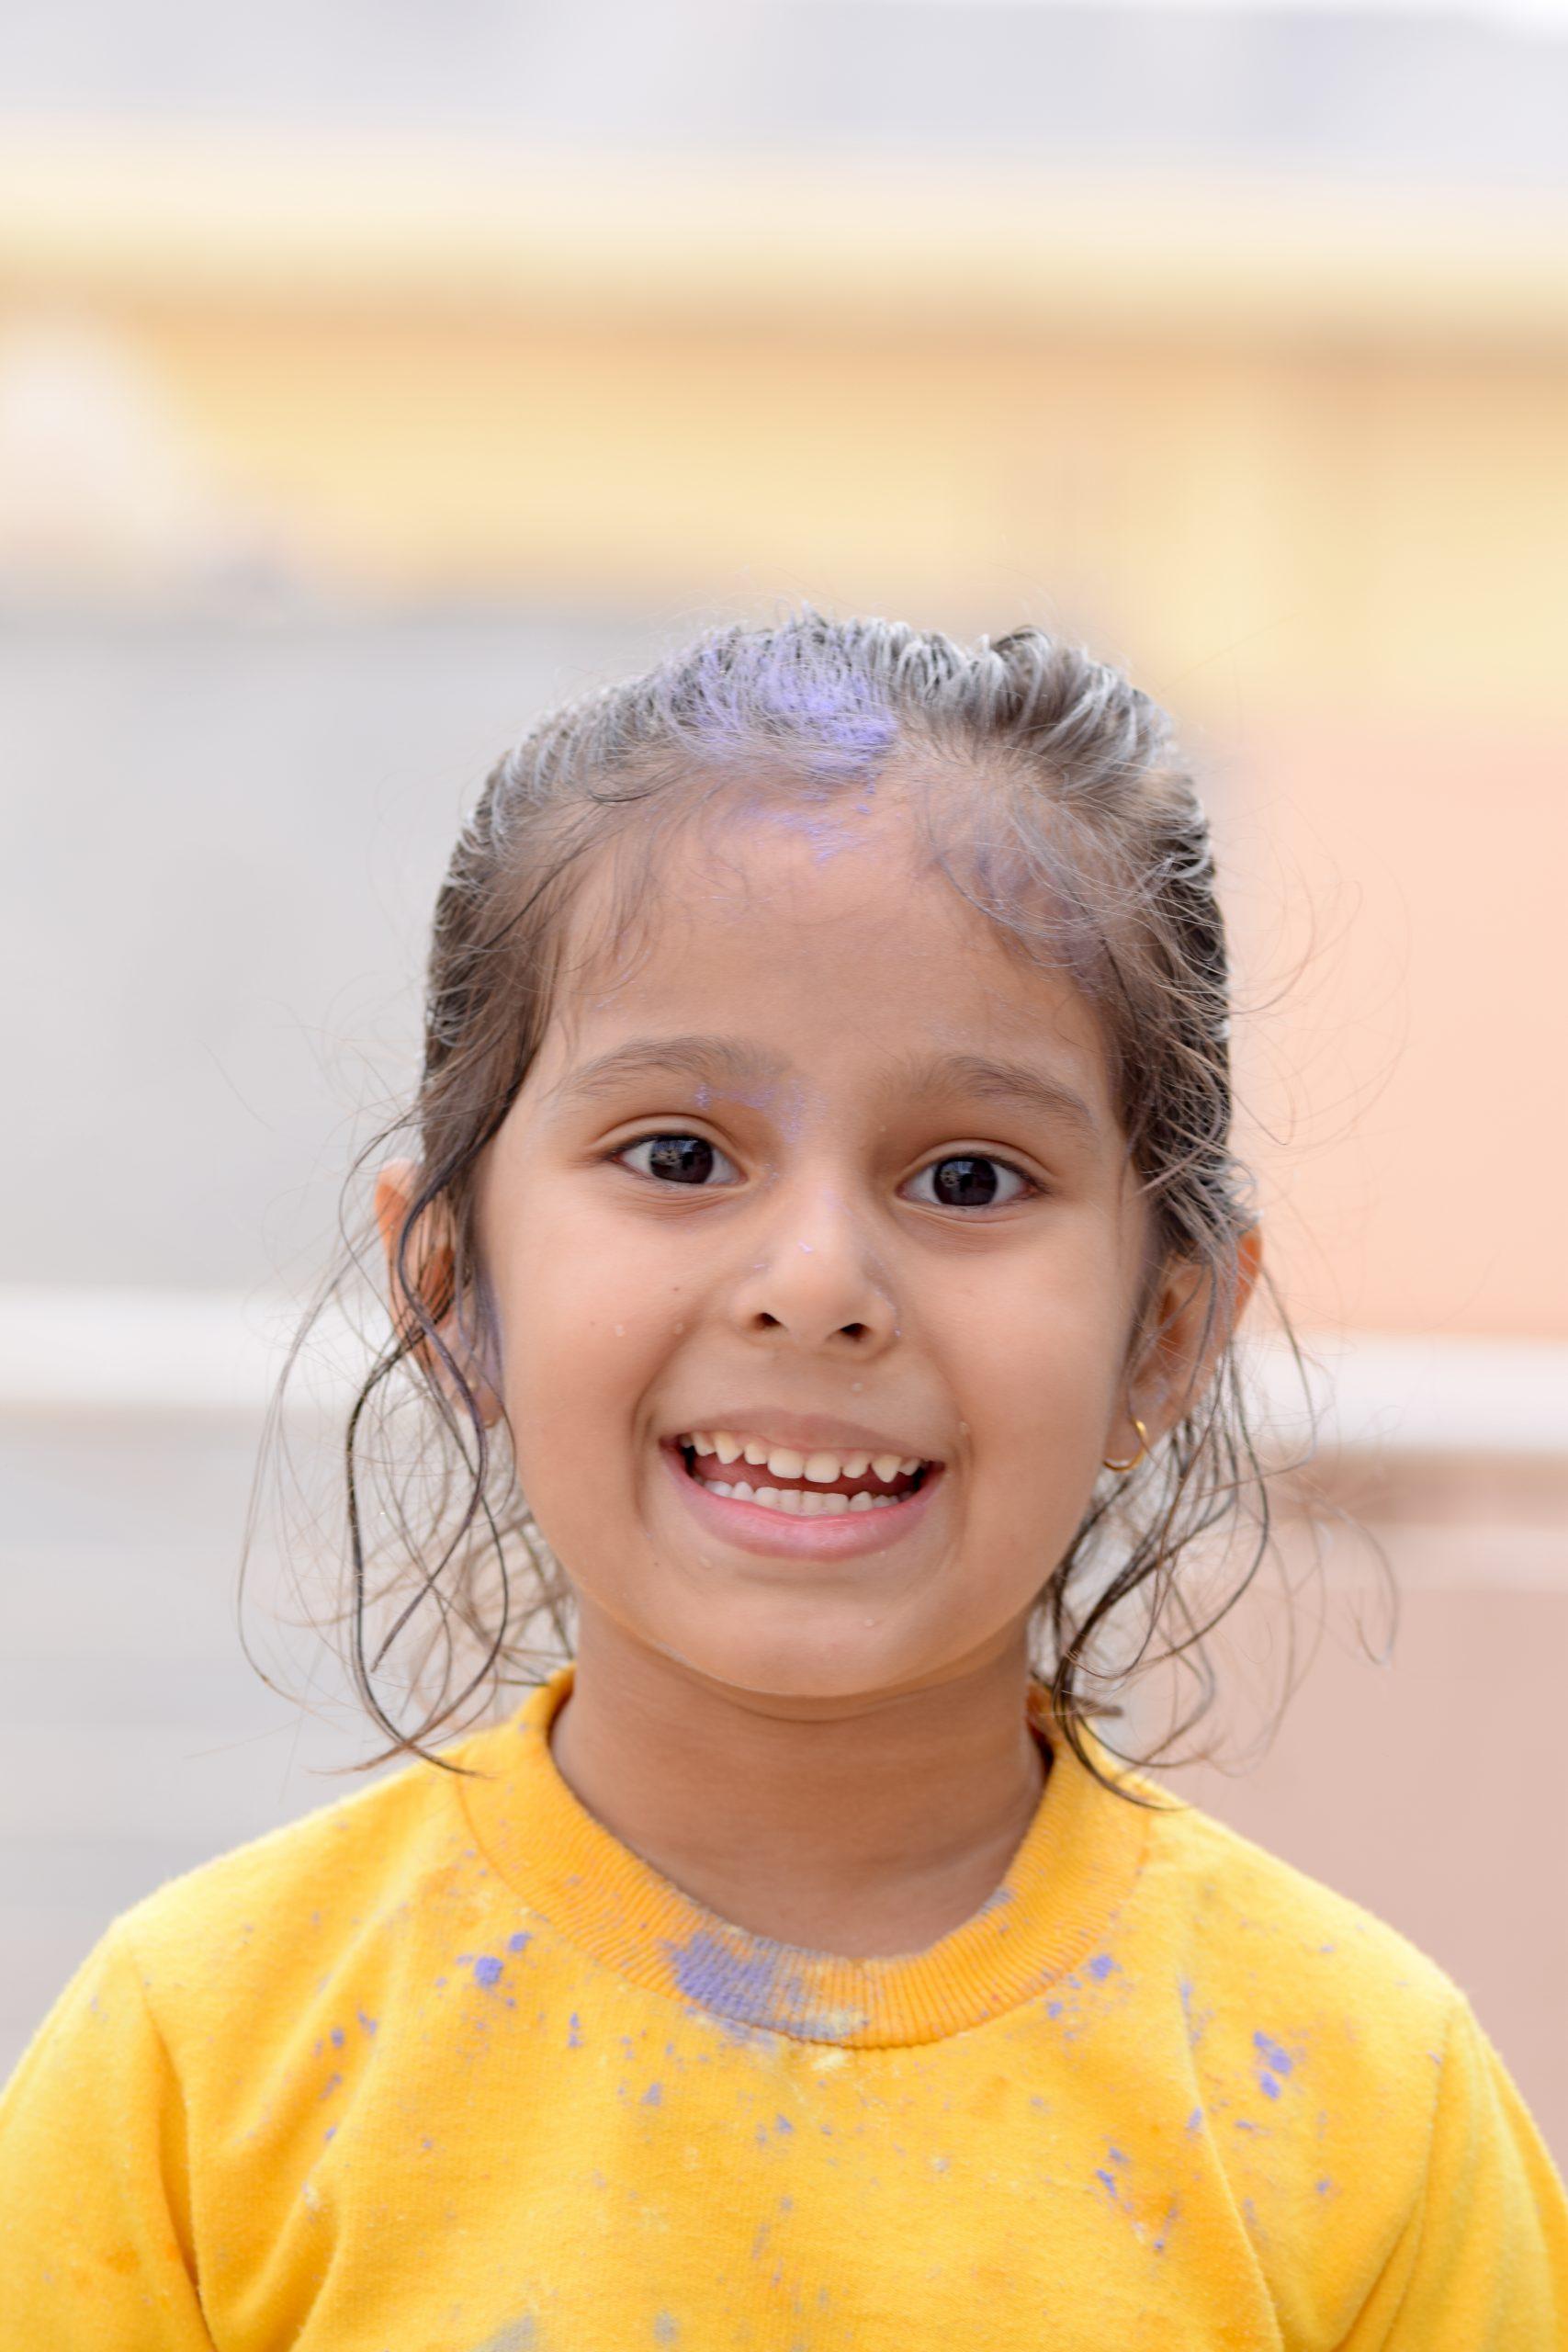 A cute little girl smiling